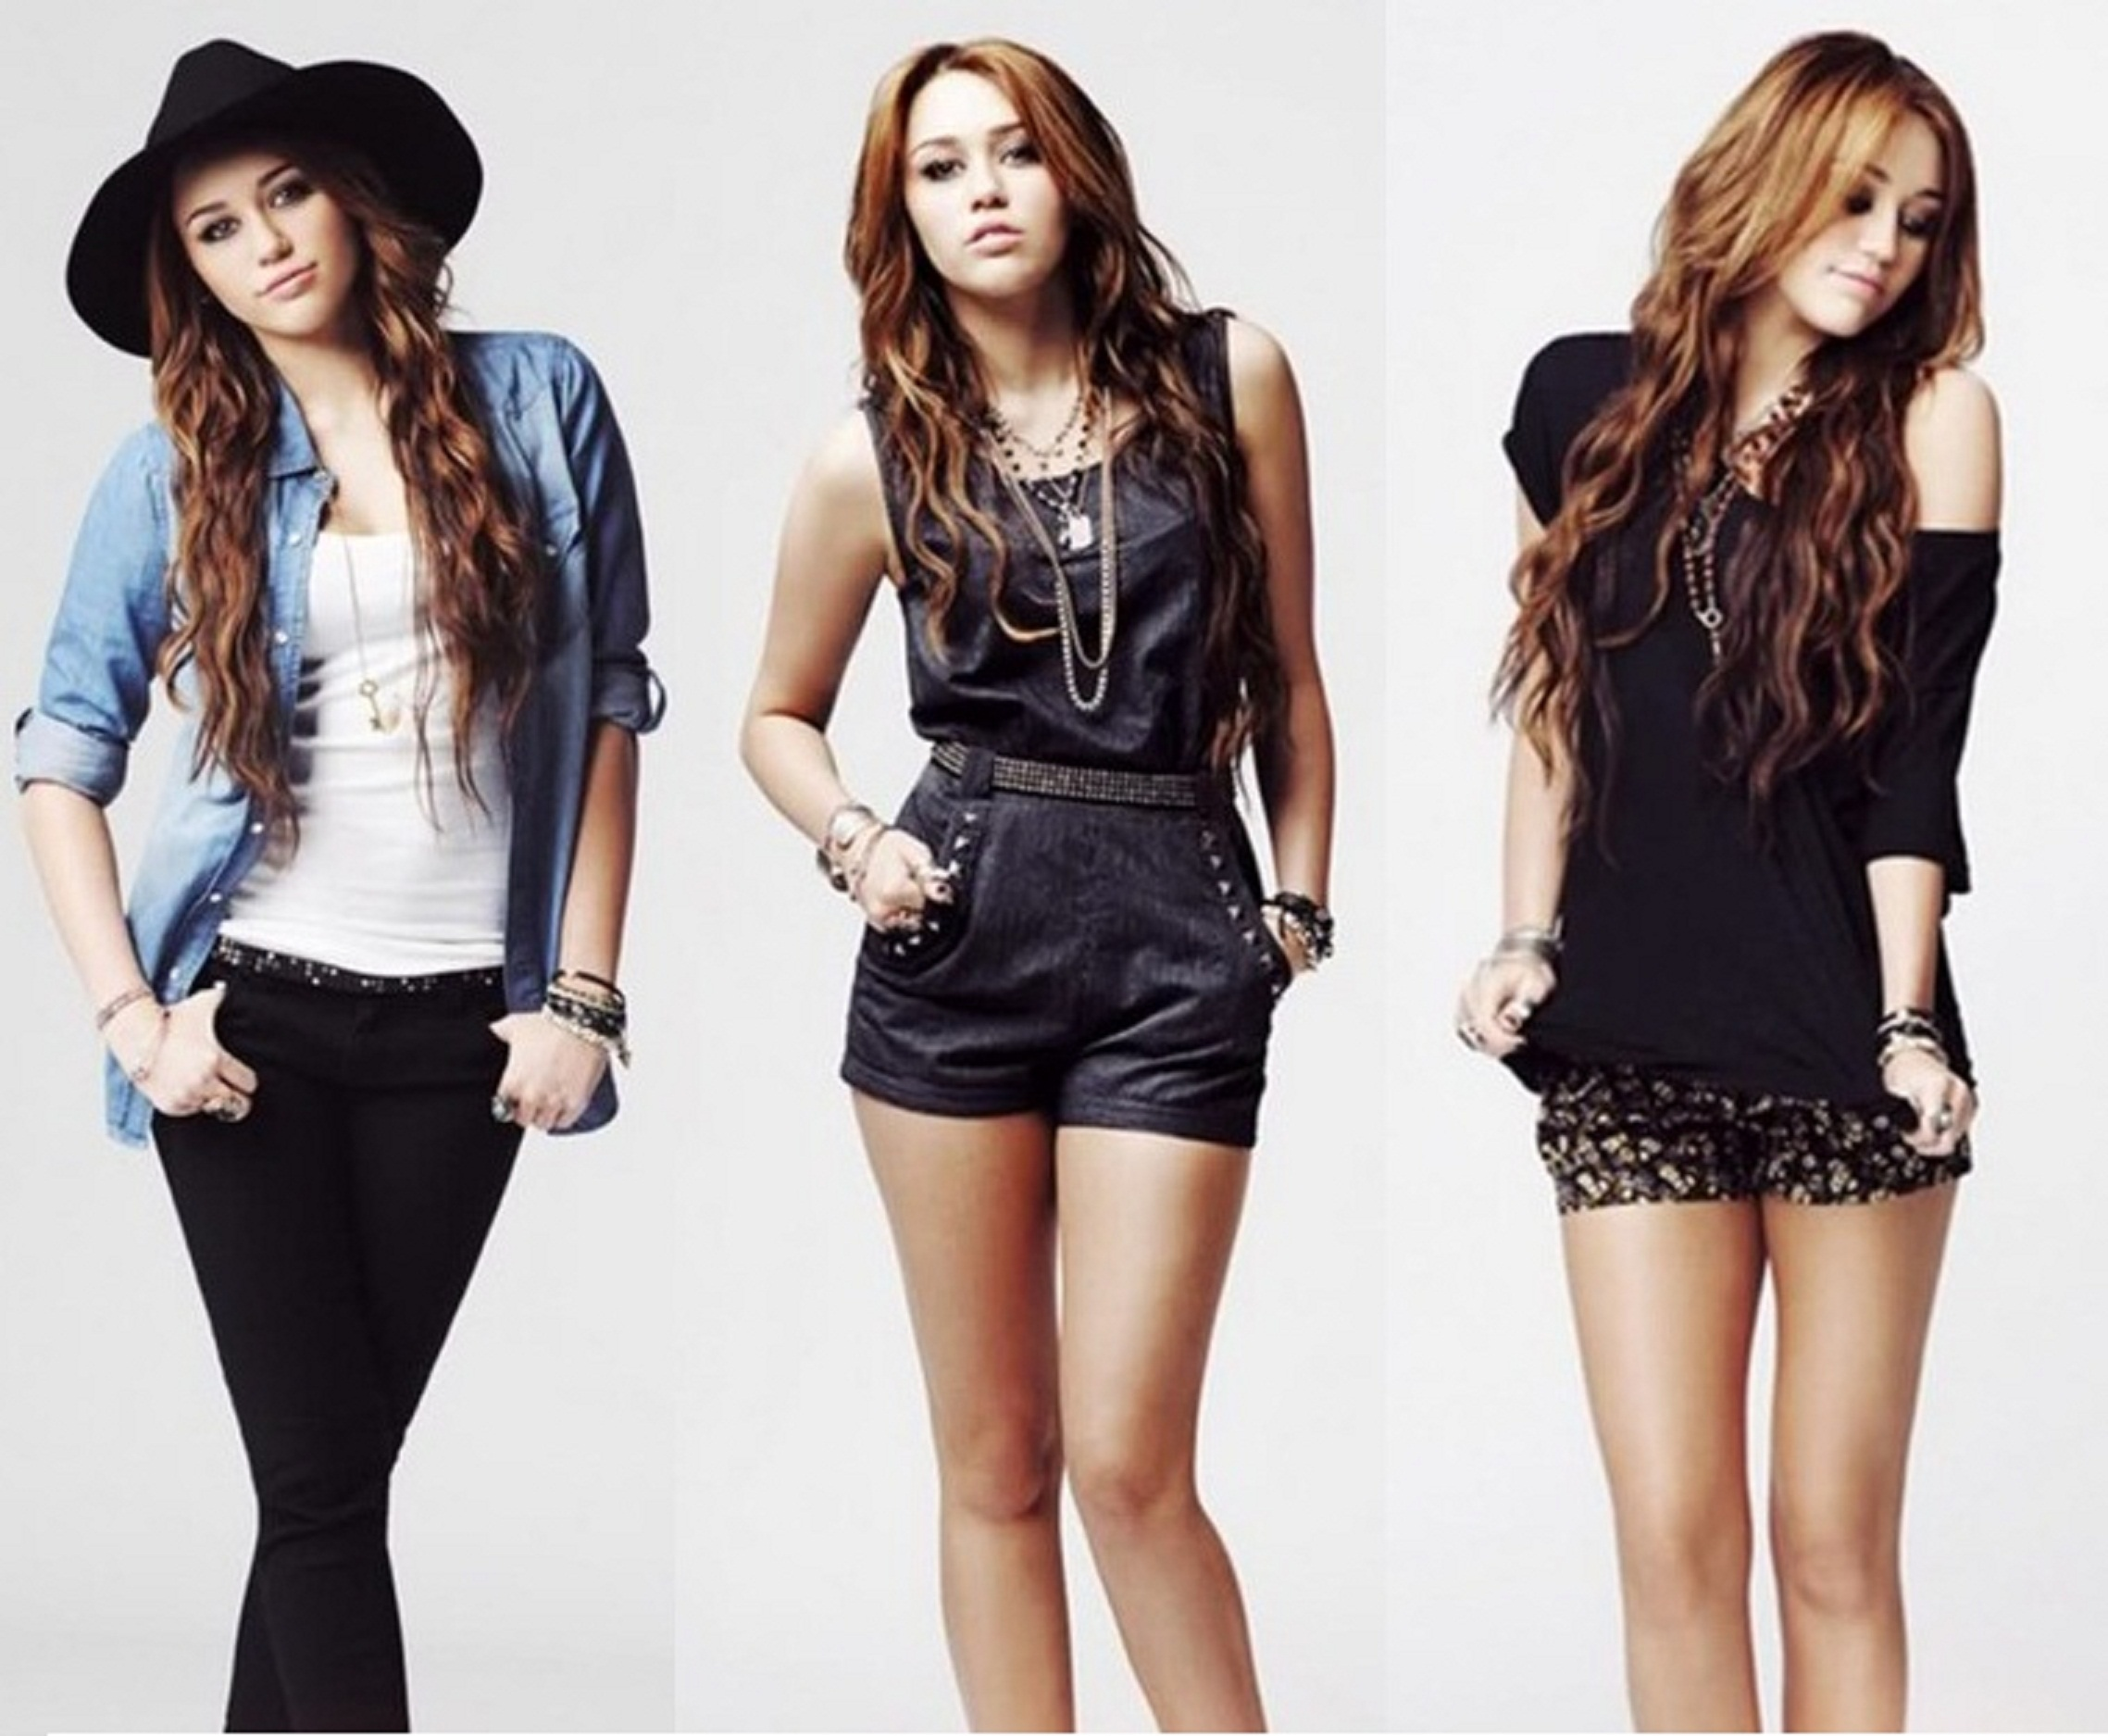 Teenage Girls Fashion And Style